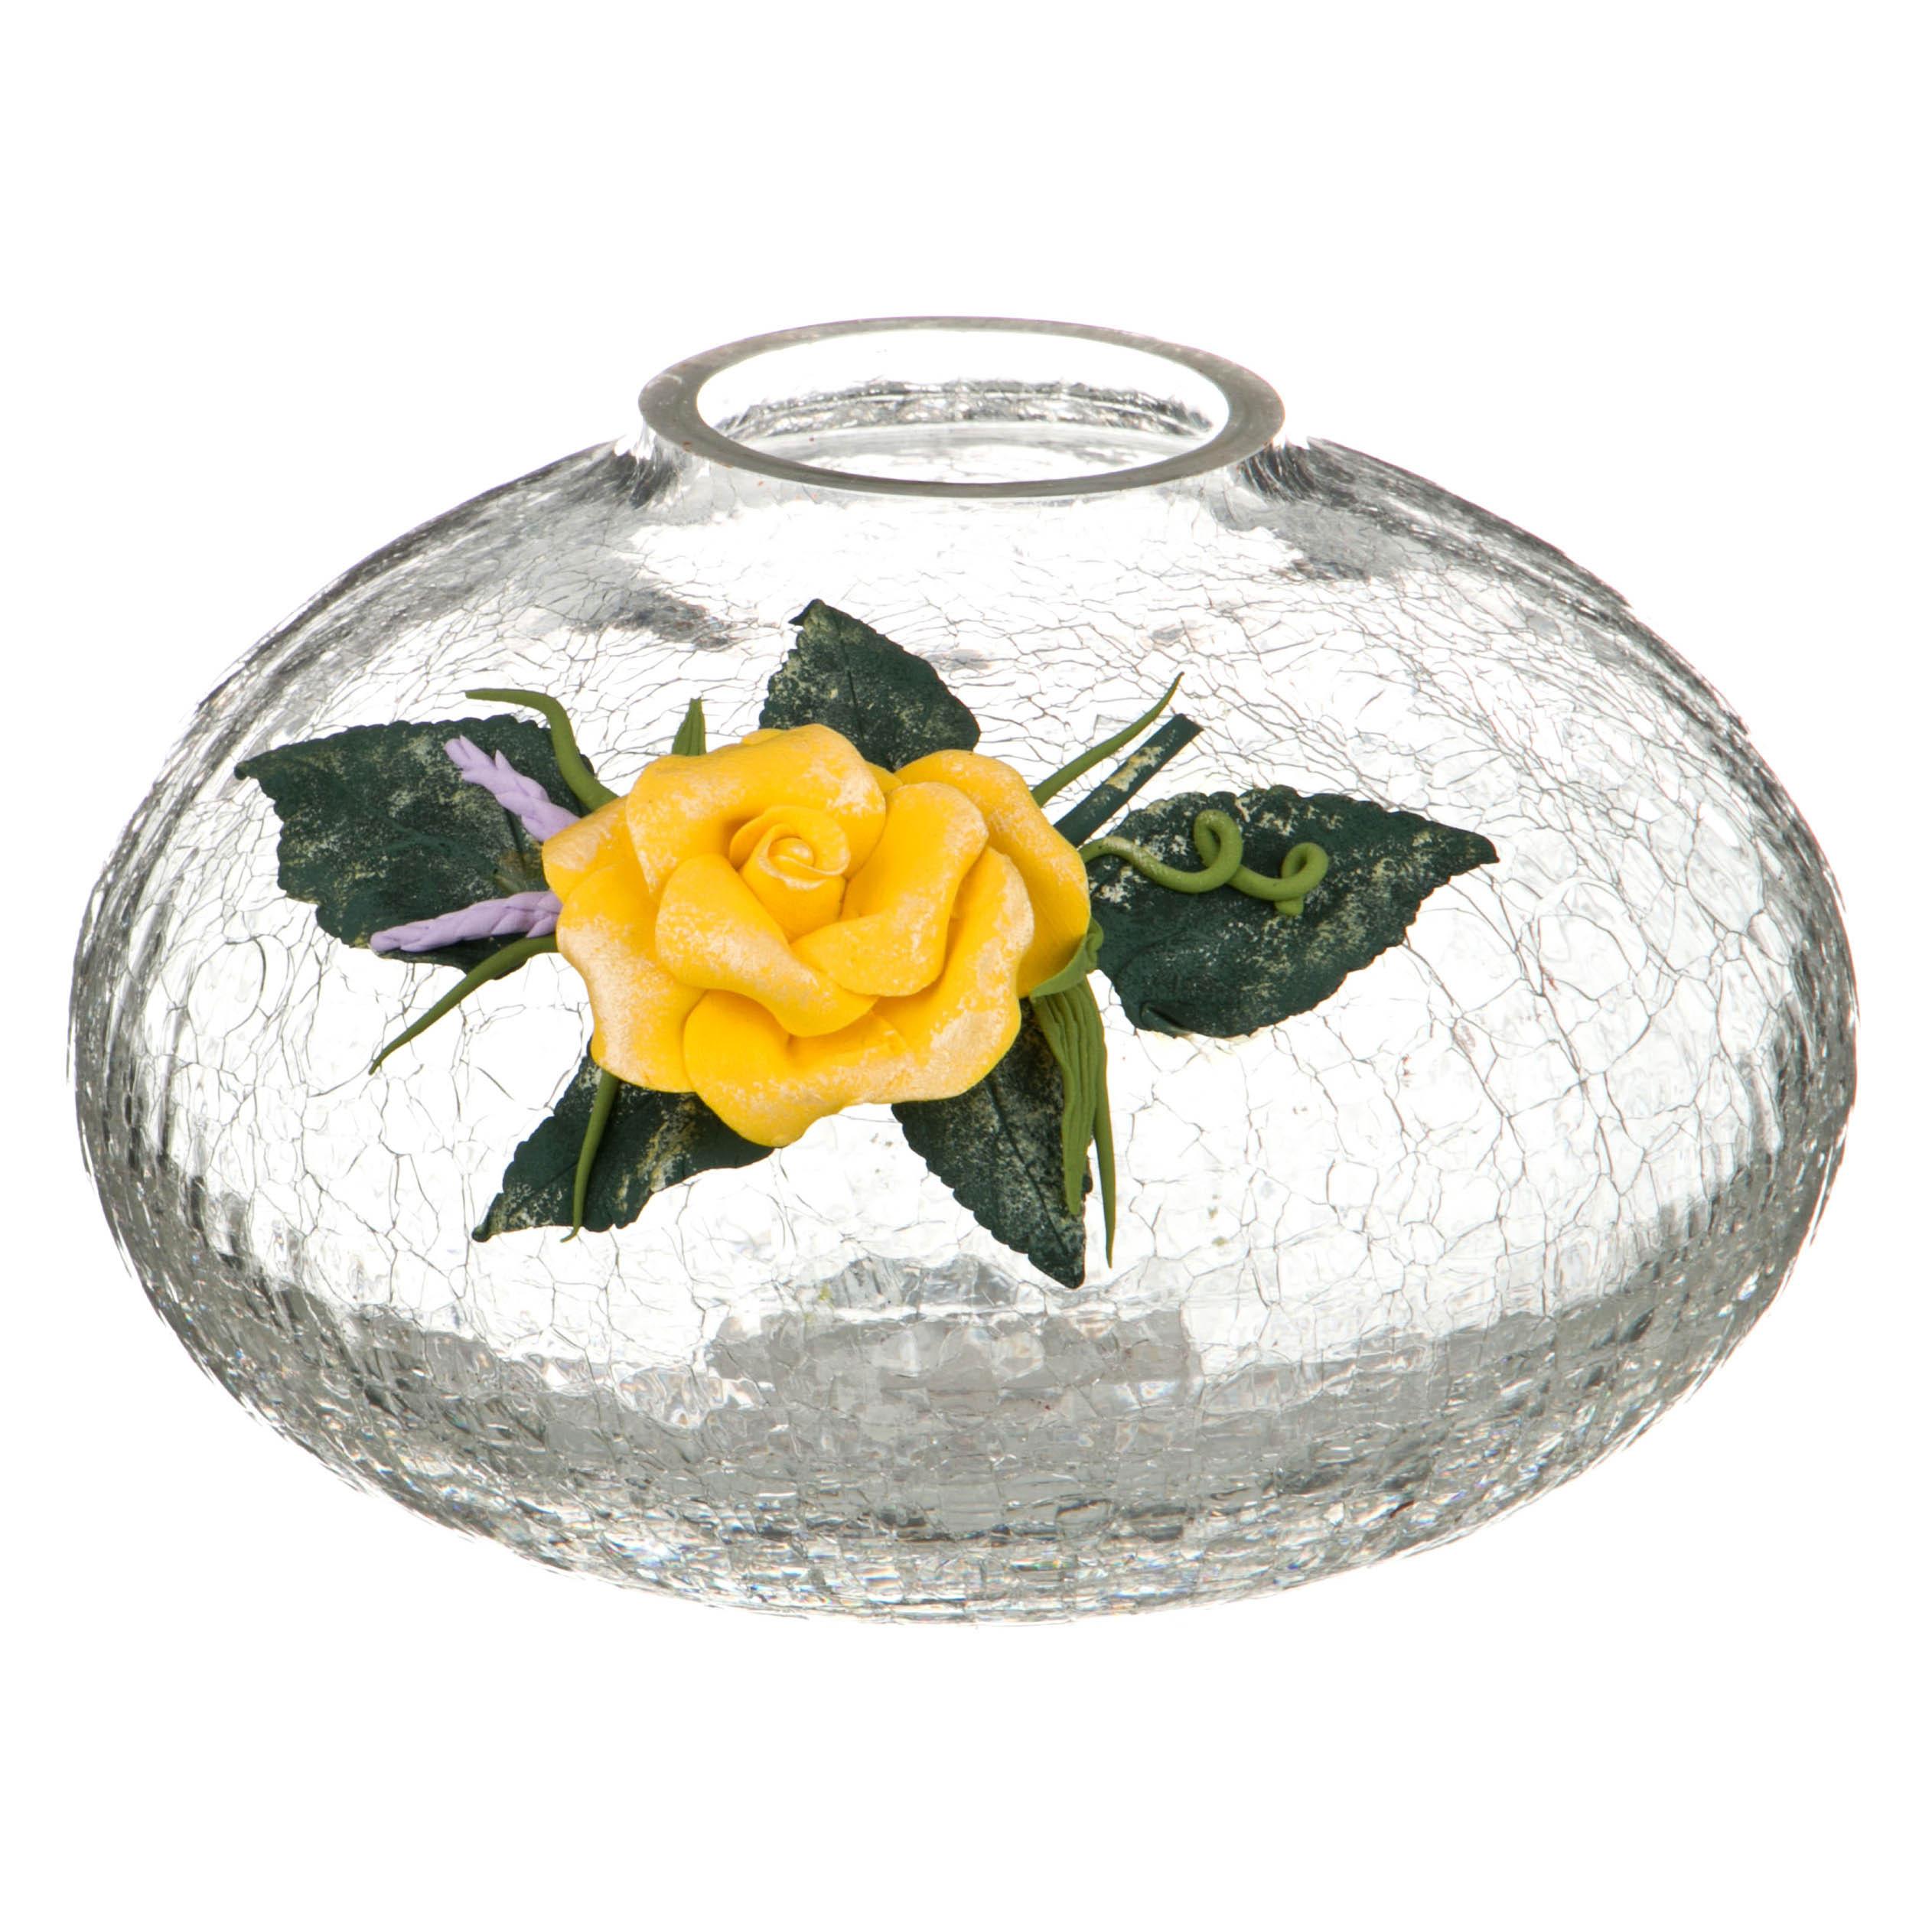 {} Arti-M Ваза Роза Цвет: Желтый (14 см) ваза сияние цвет желтый 51 см 1984744